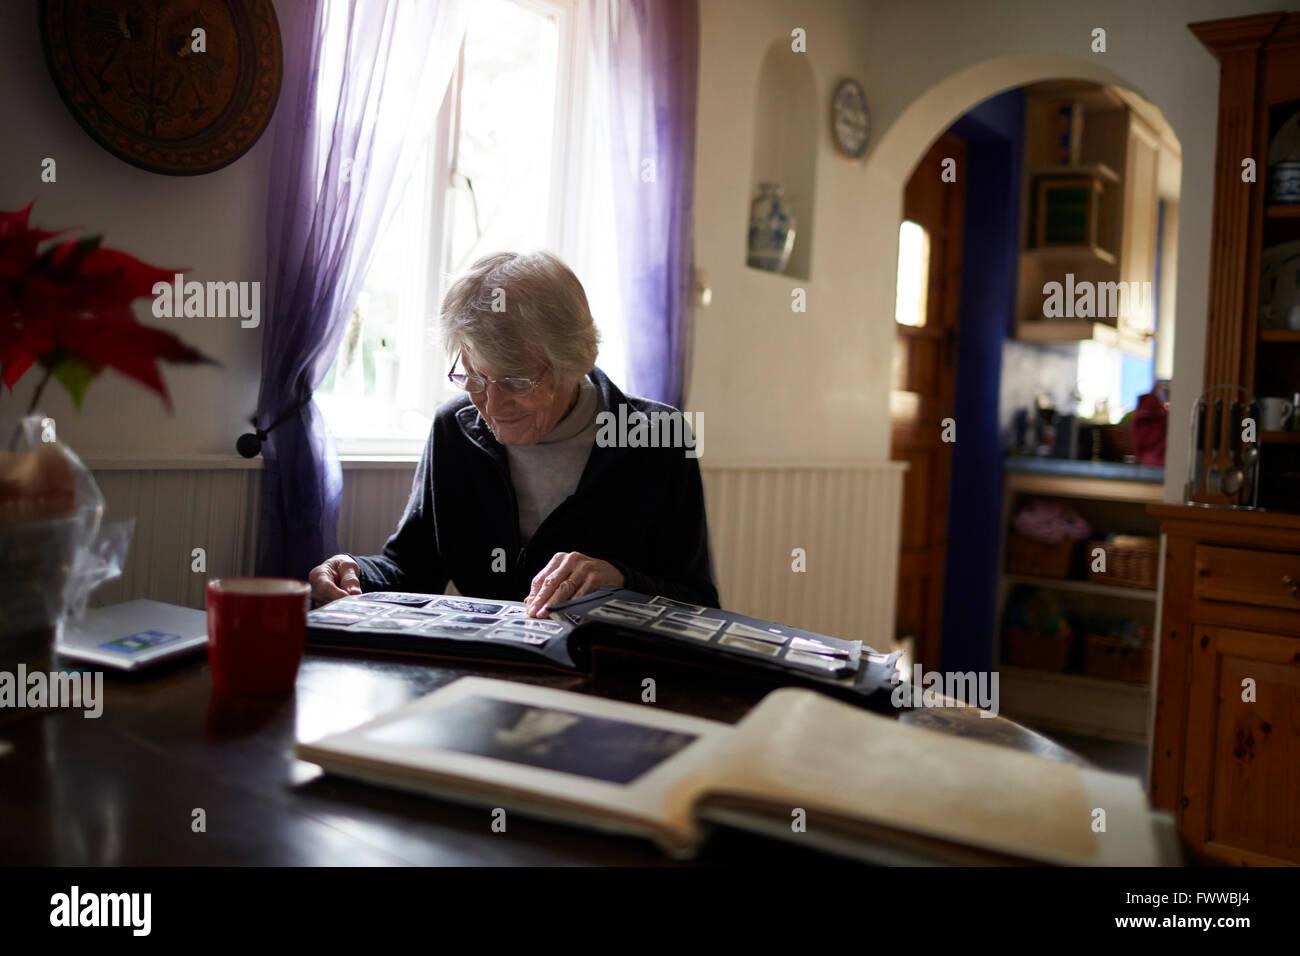 Senior Woman Looking Through Photo Album At Home - Stock Image